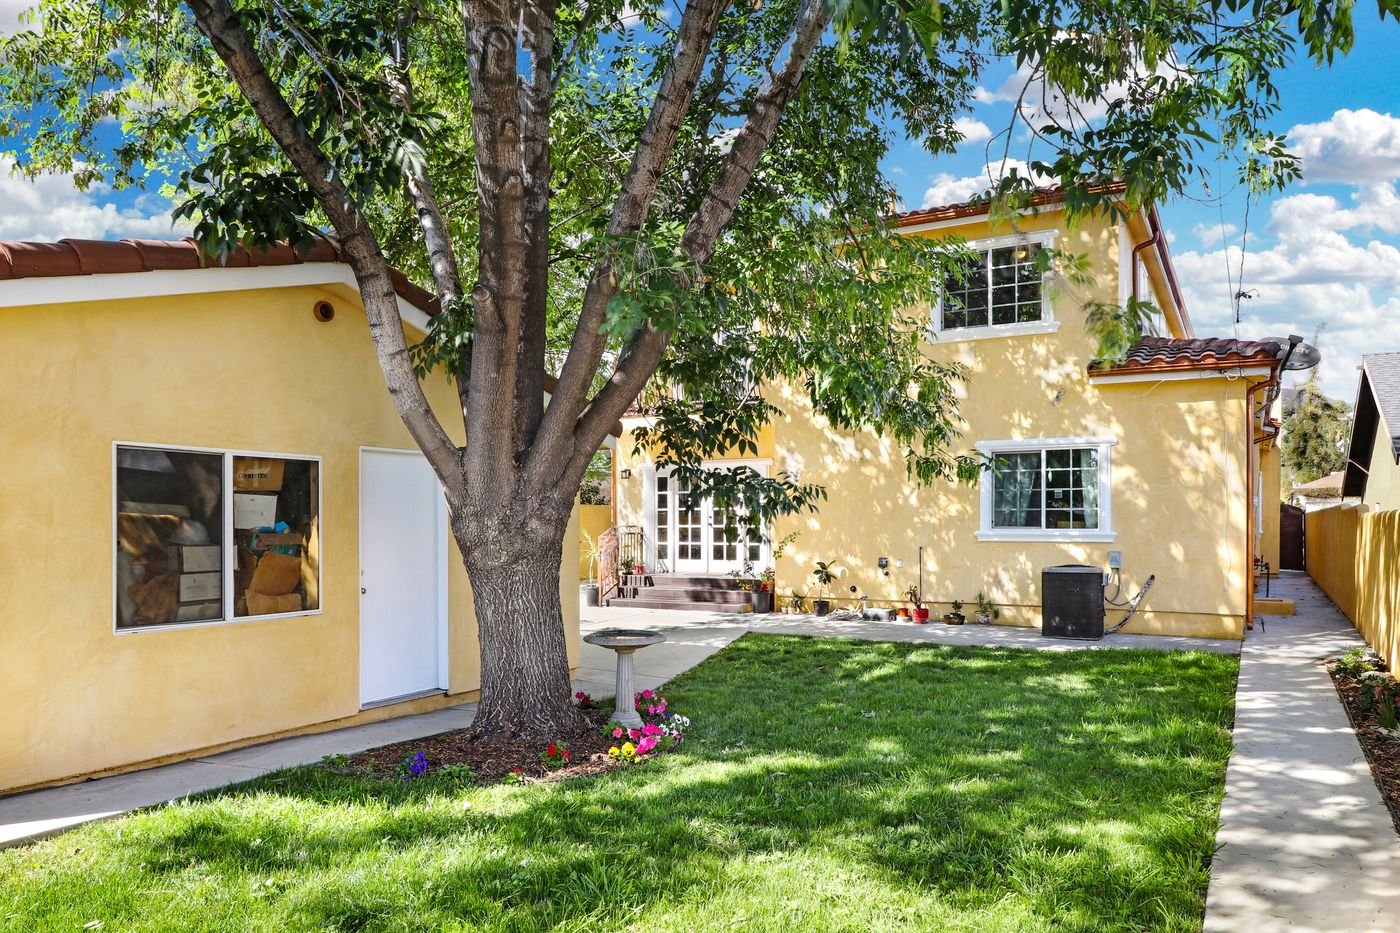 real-estate-photography-los-angeles-pasadena-glendale-burbank-AD-photographer-24